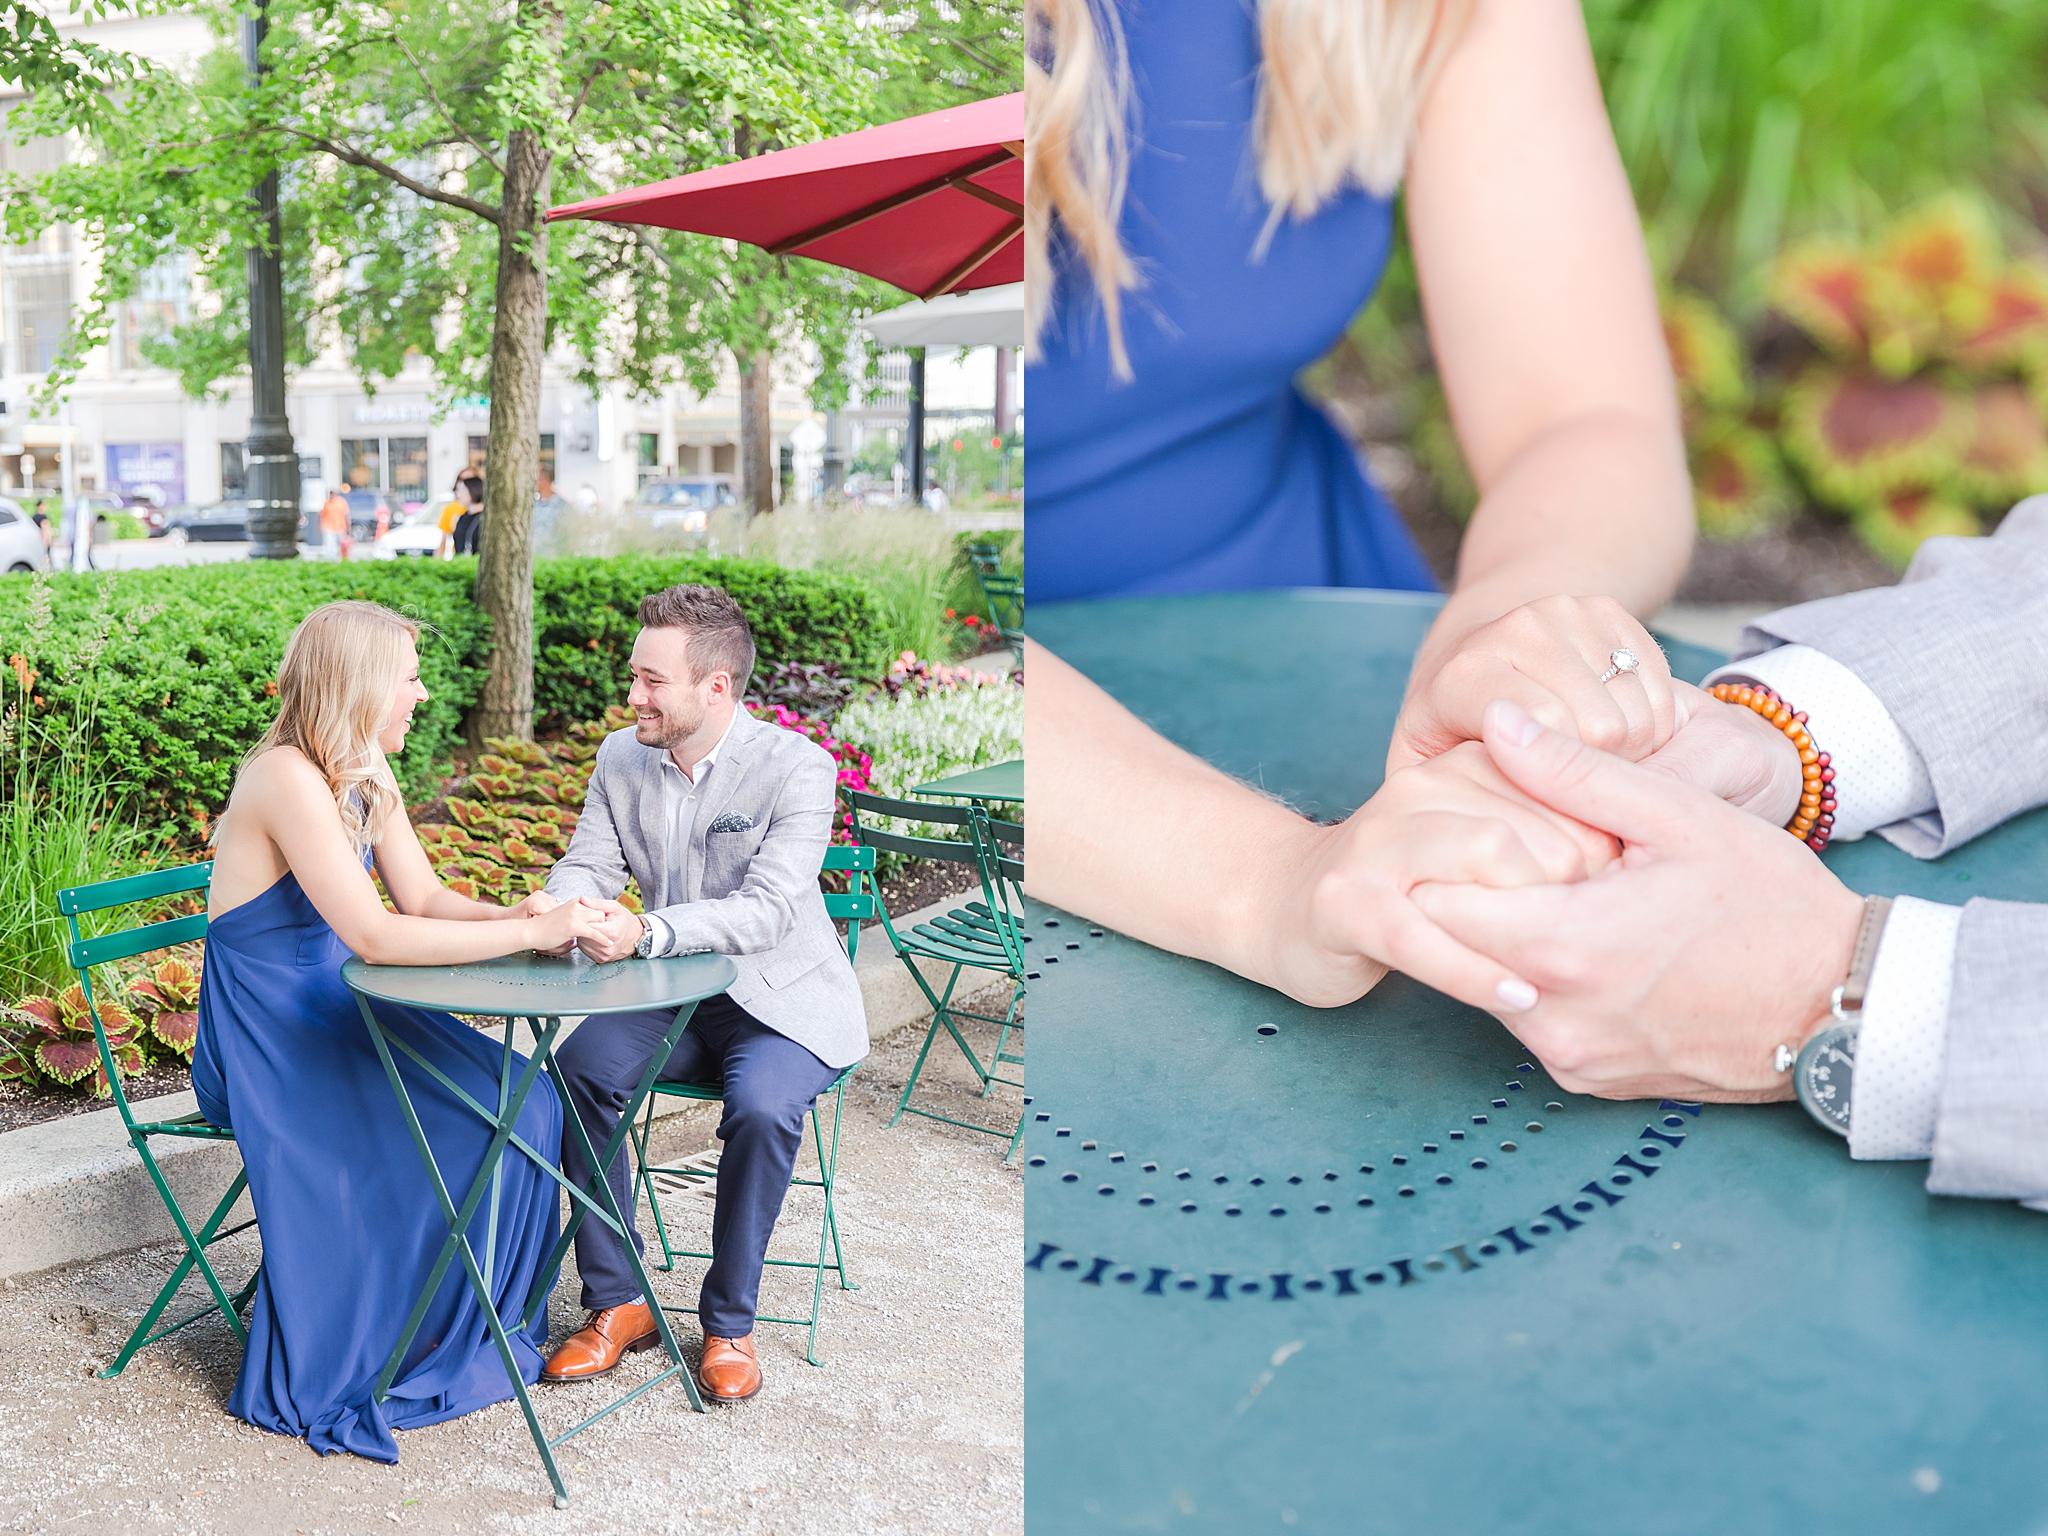 detroit-wedding-photographer-downtown-detroit-belle-isle-engagement-photos-sarah-eric-by-courtney-carolyn-photography_0017.jpg